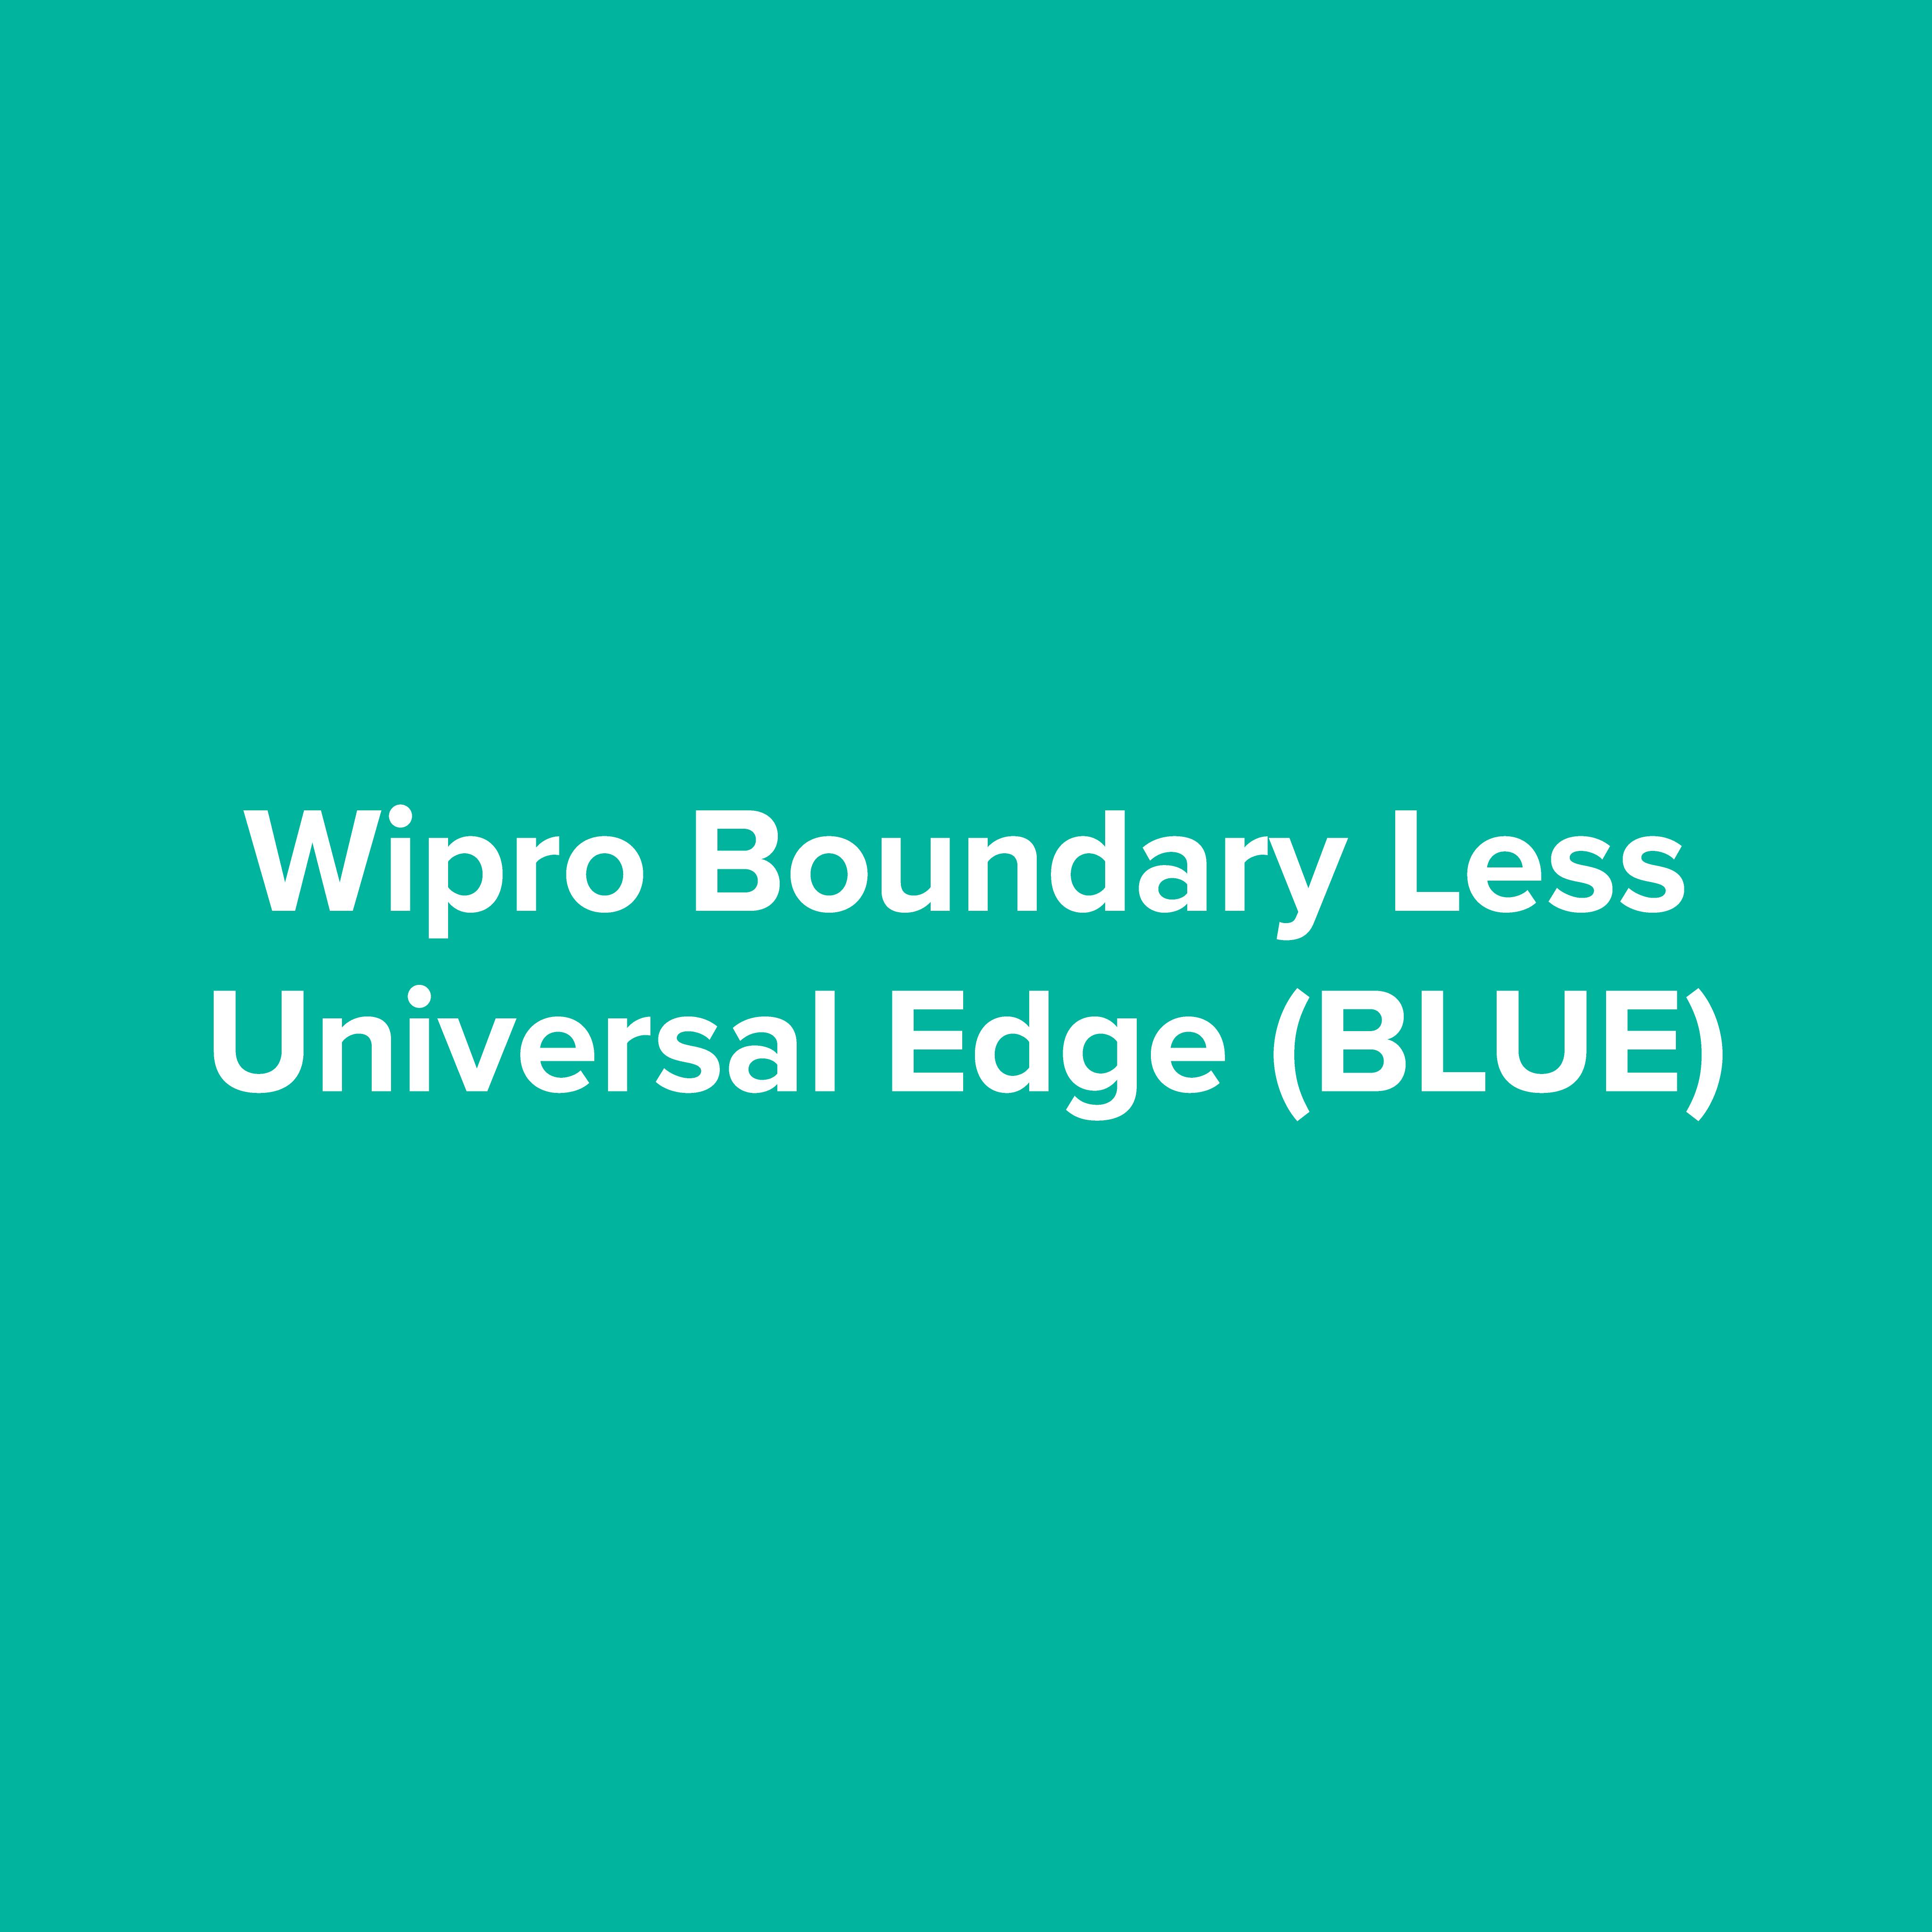 Wipro BoundaryLess Universal Edge (BLUE)